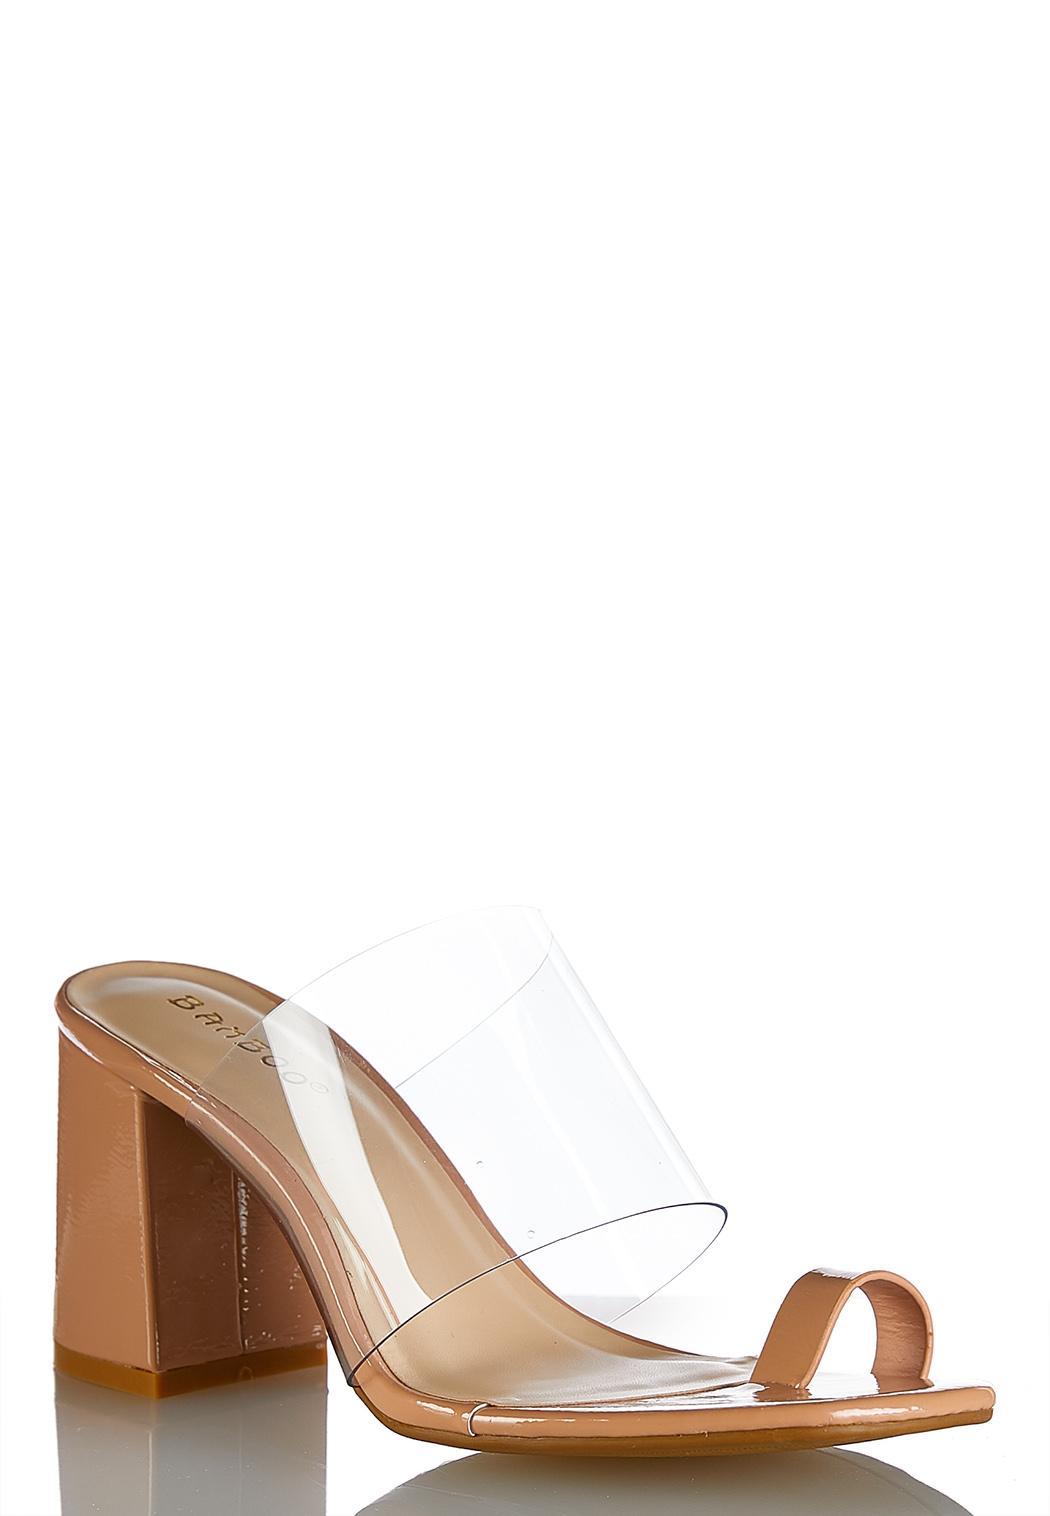 Lucite Toe Loop Heeled Sandals